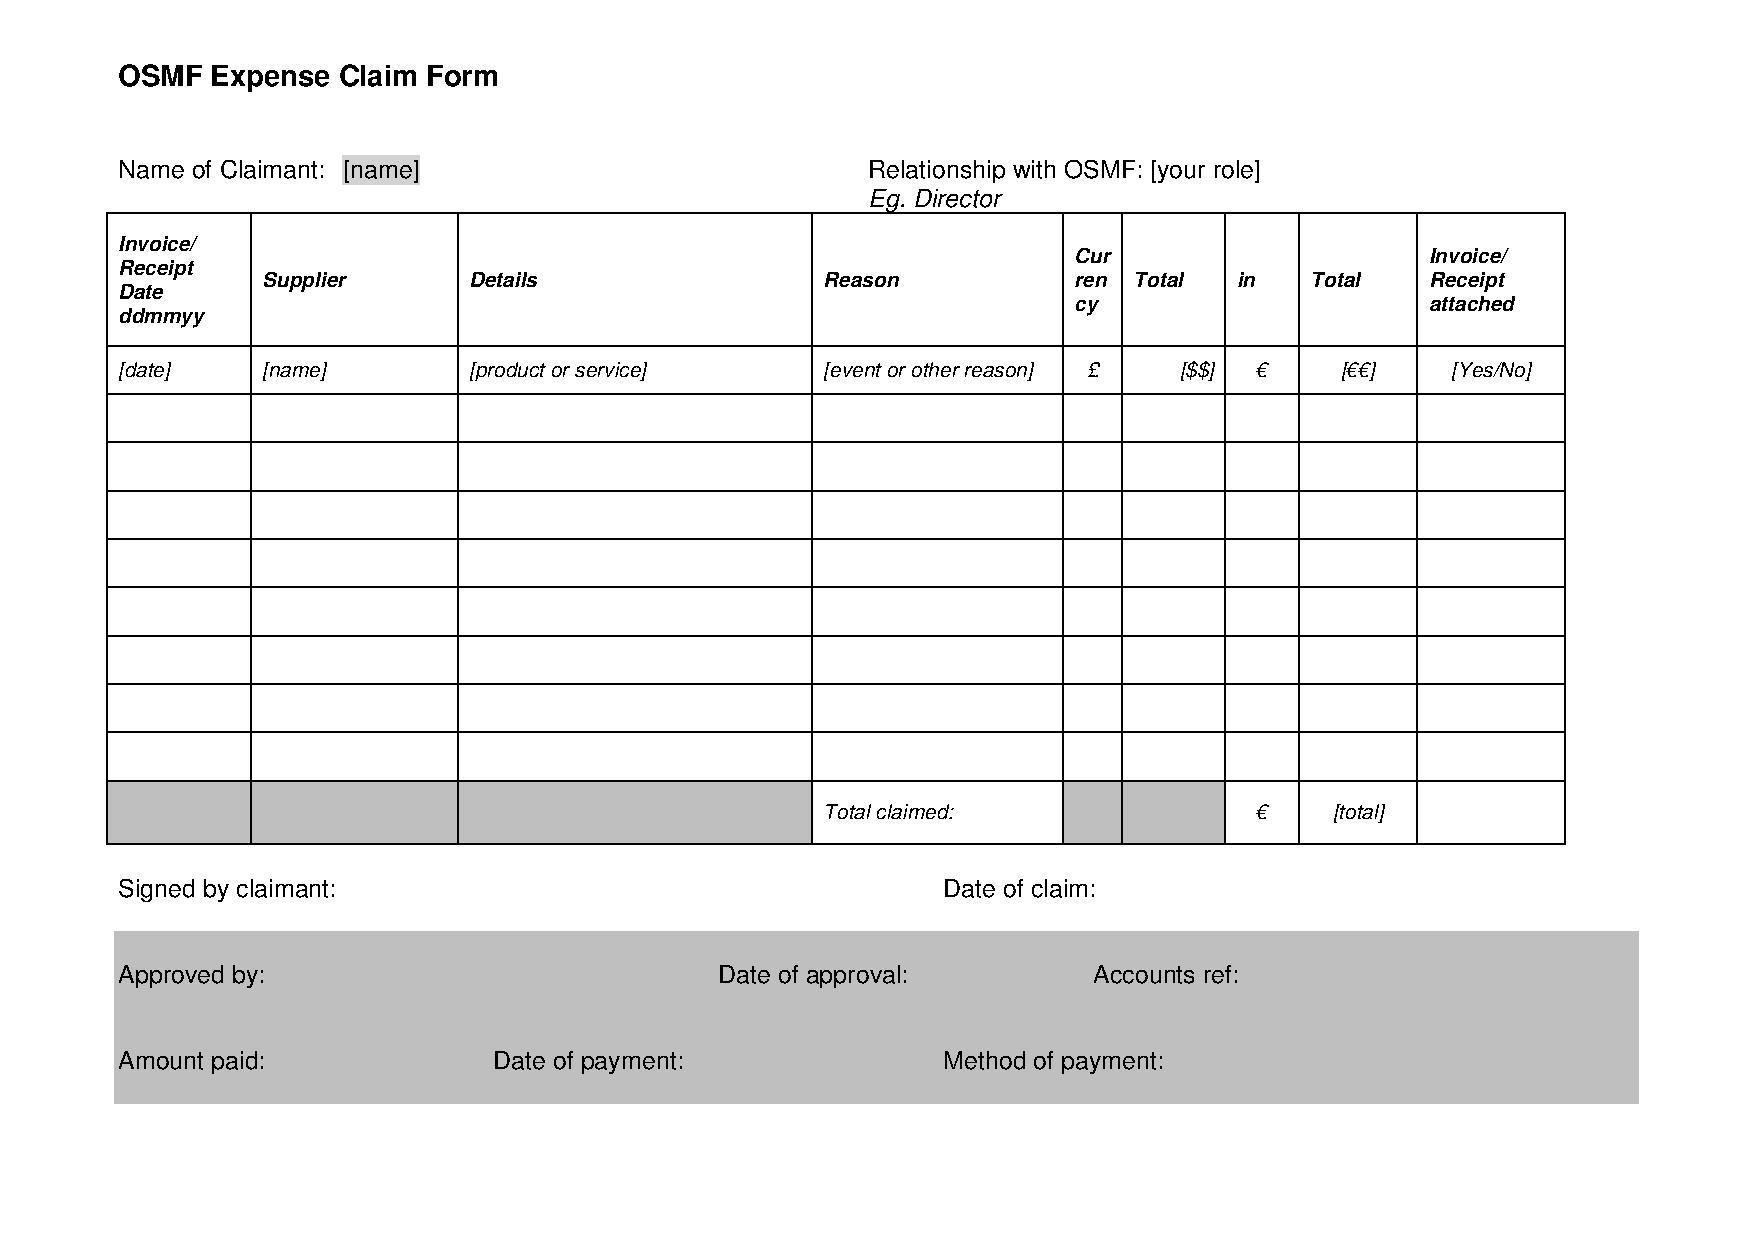 Claim Form In Pdf | File Osmf Expenses Claim Form V1 1 Pdf Openstreetmap Foundation